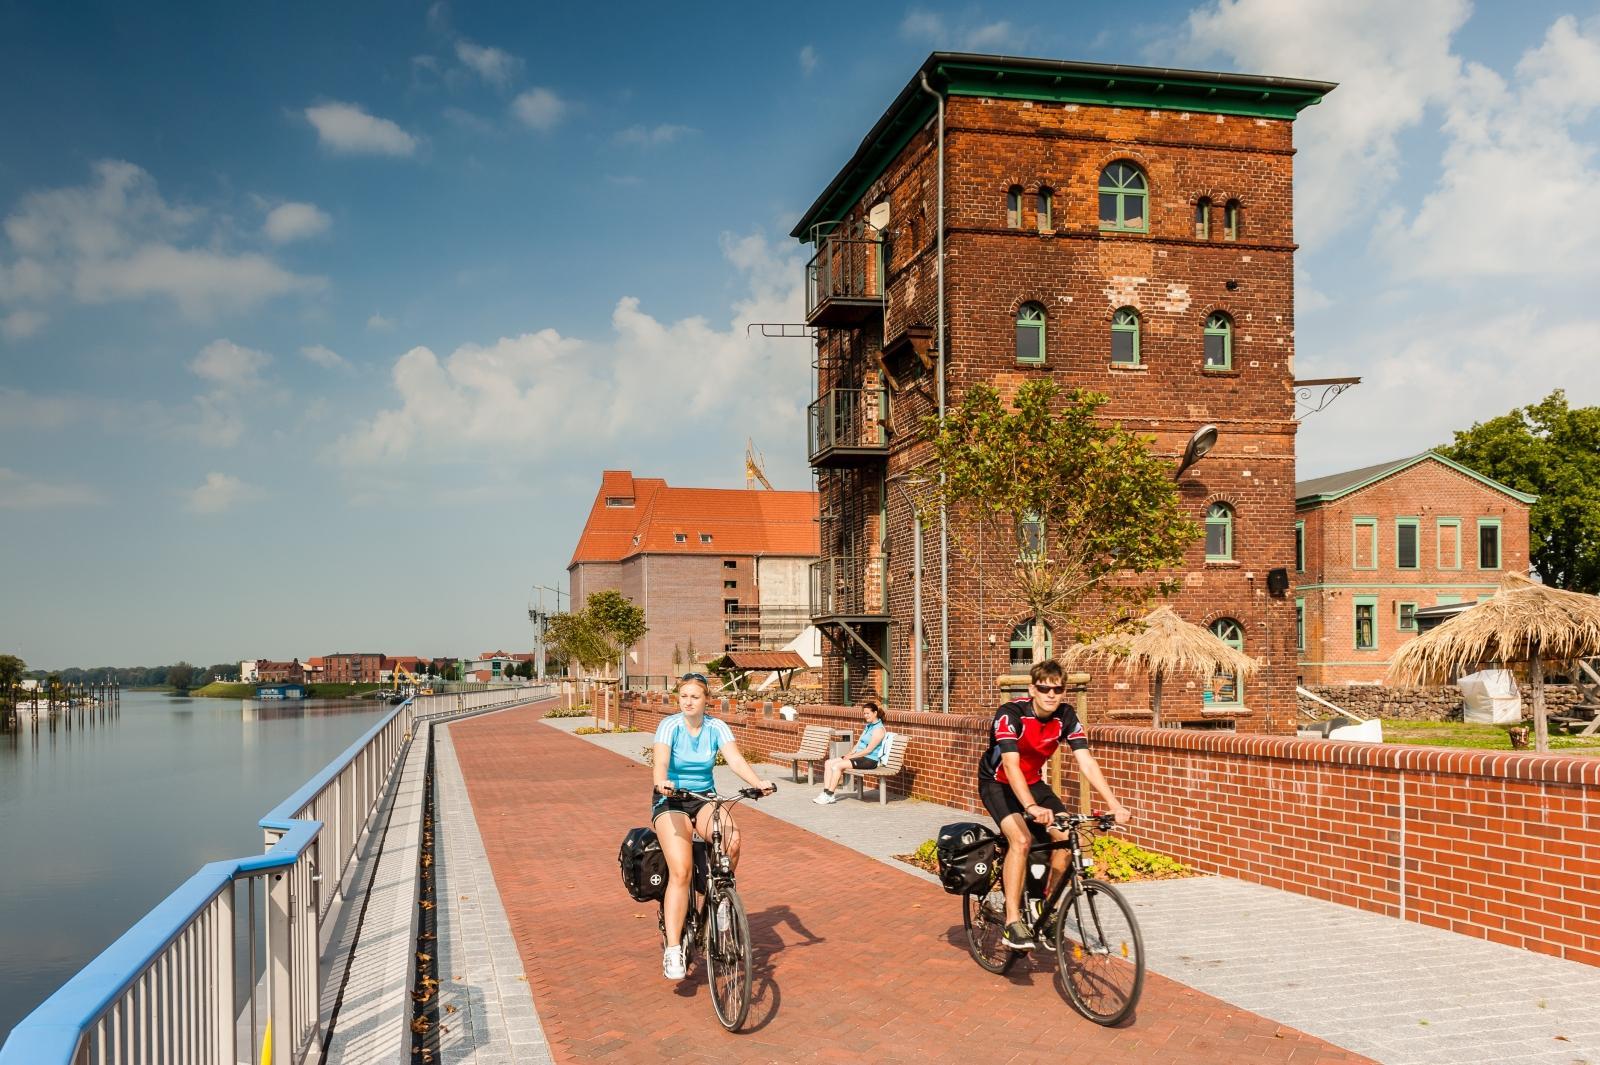 Radfahrer_Promenade